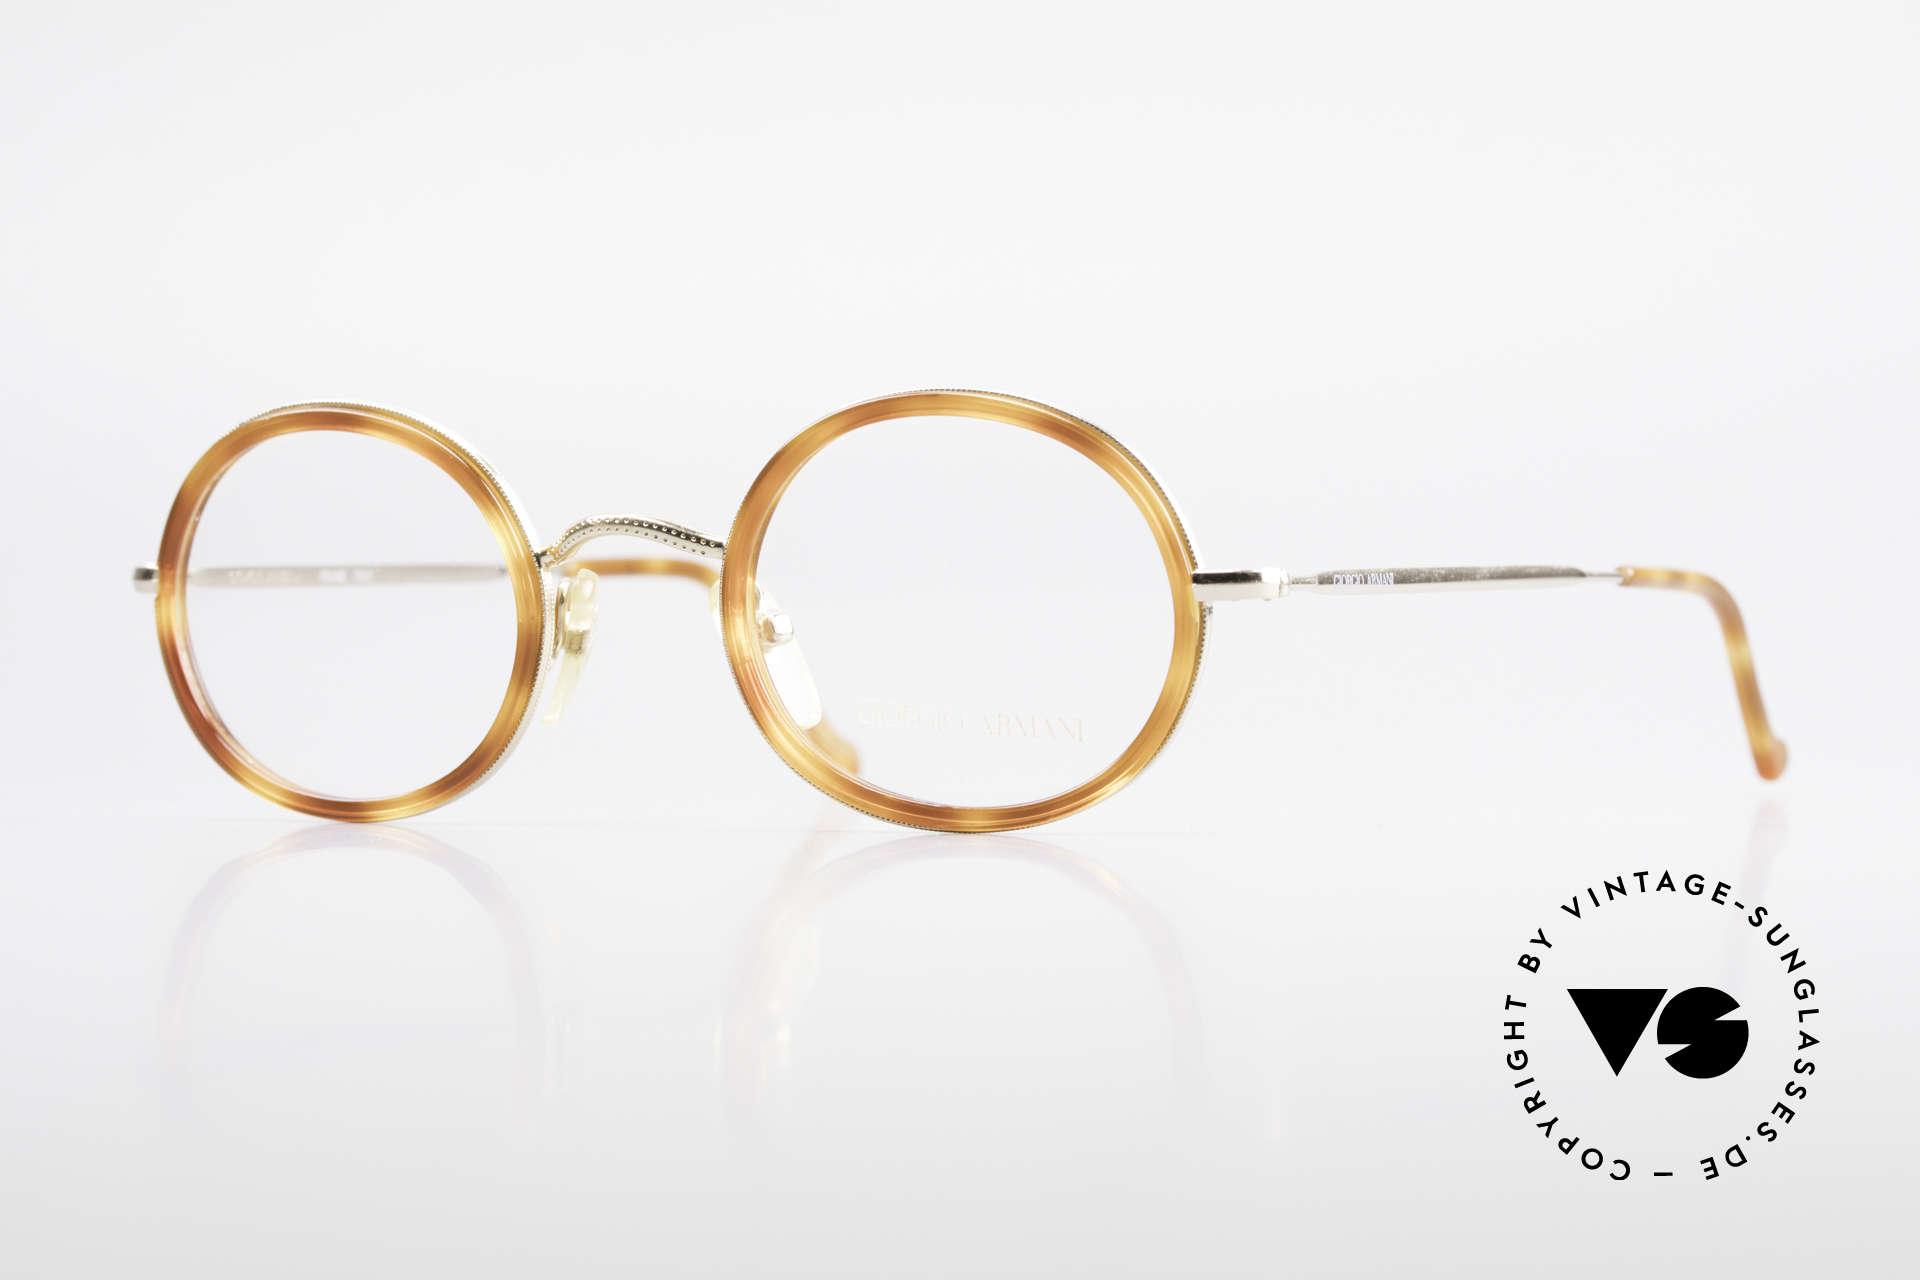 Giorgio Armani 139 Oval Vintage Eyeglasses 90's, vintage designer eyeglass-frame by GIORGIO Armani, Made for Men and Women